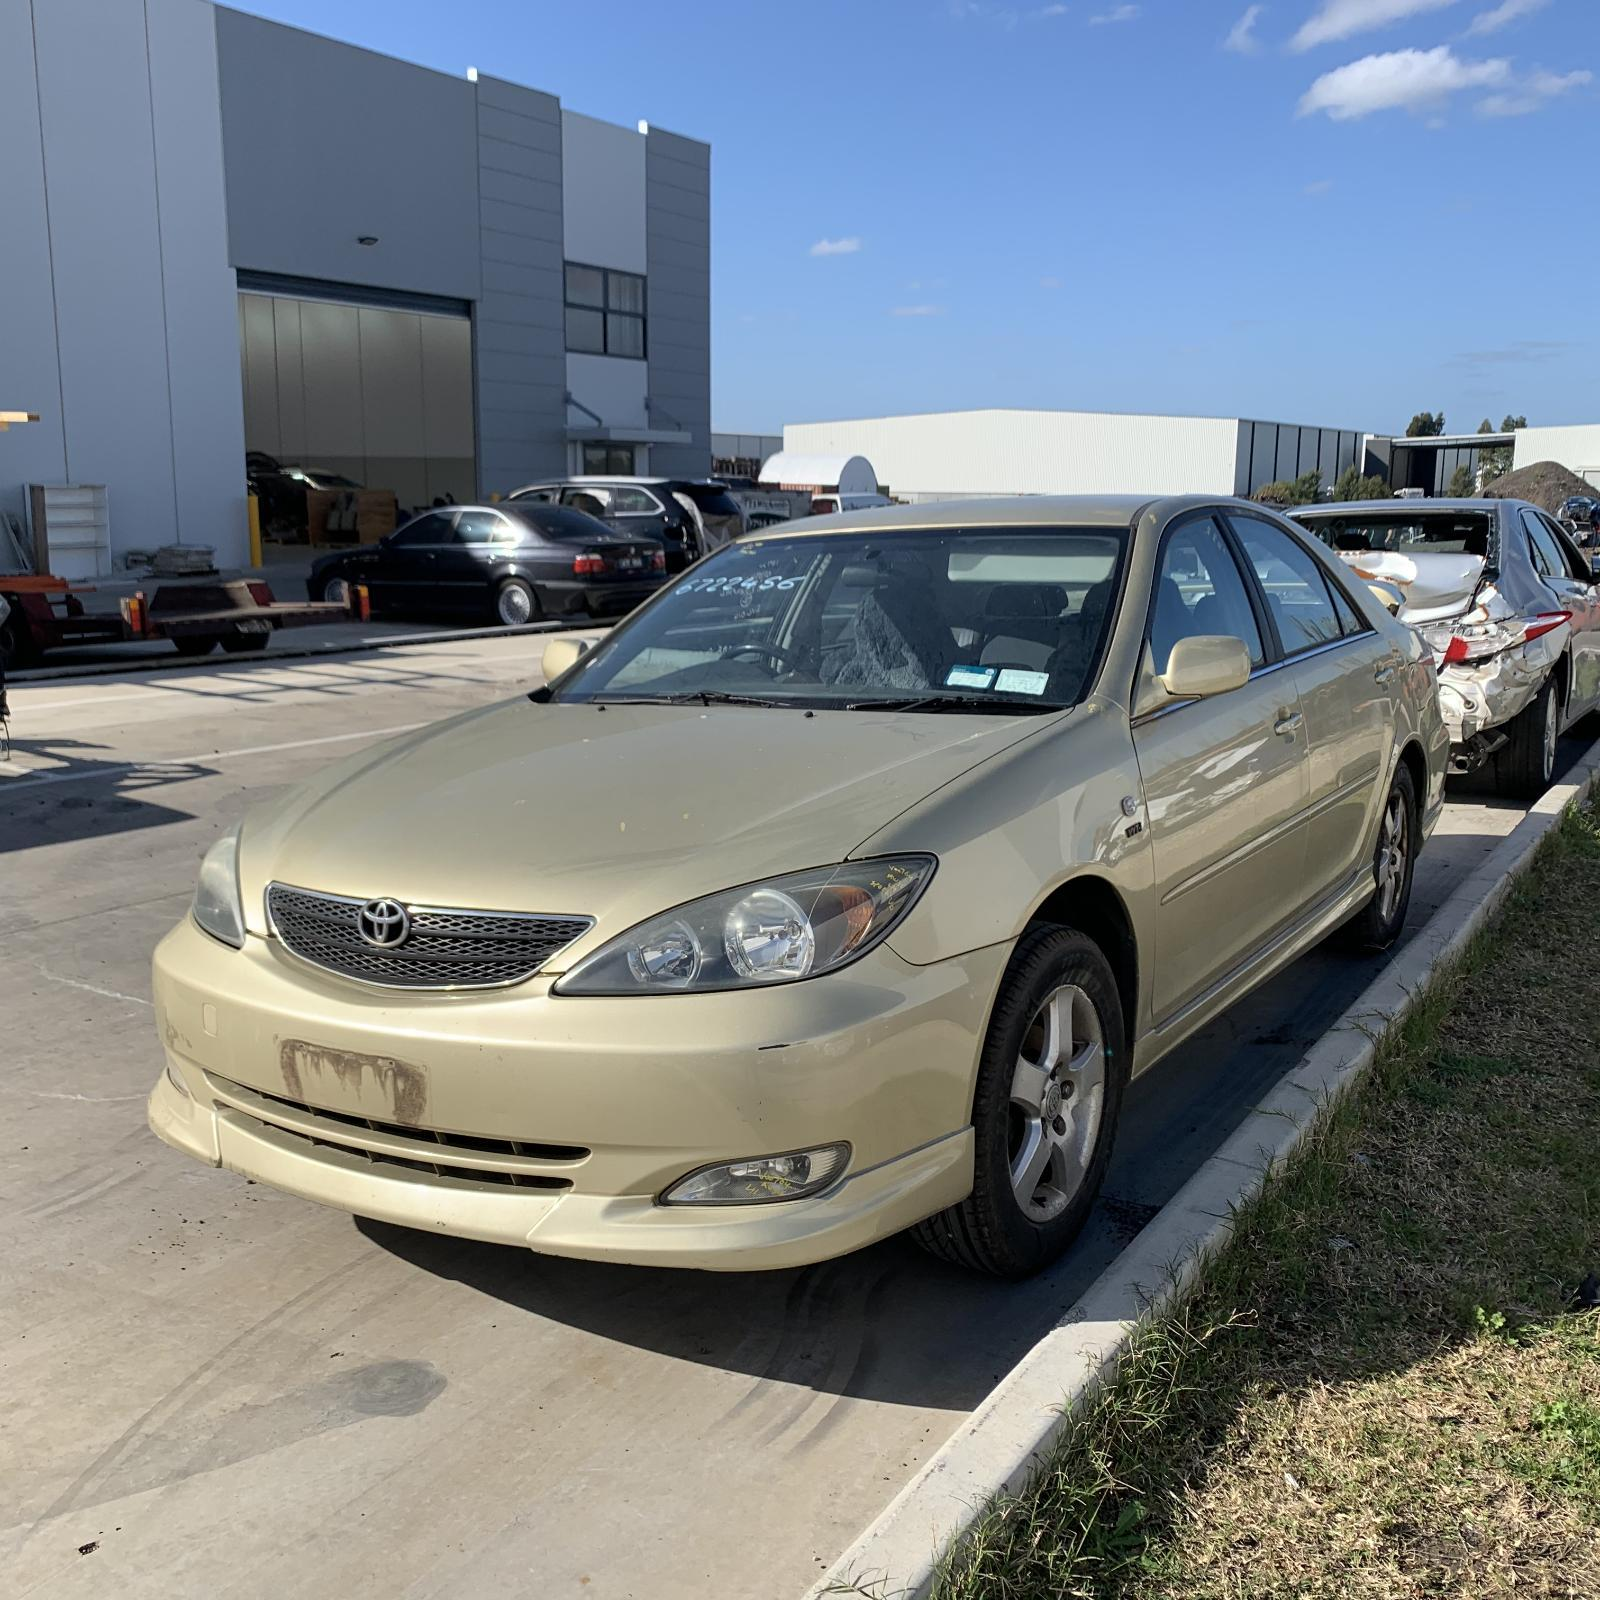 Toyota CAMRY SPORTIVO 2AZ-FE 2.4L Engine Automatic FWD Transmission 08/02 - 05/06